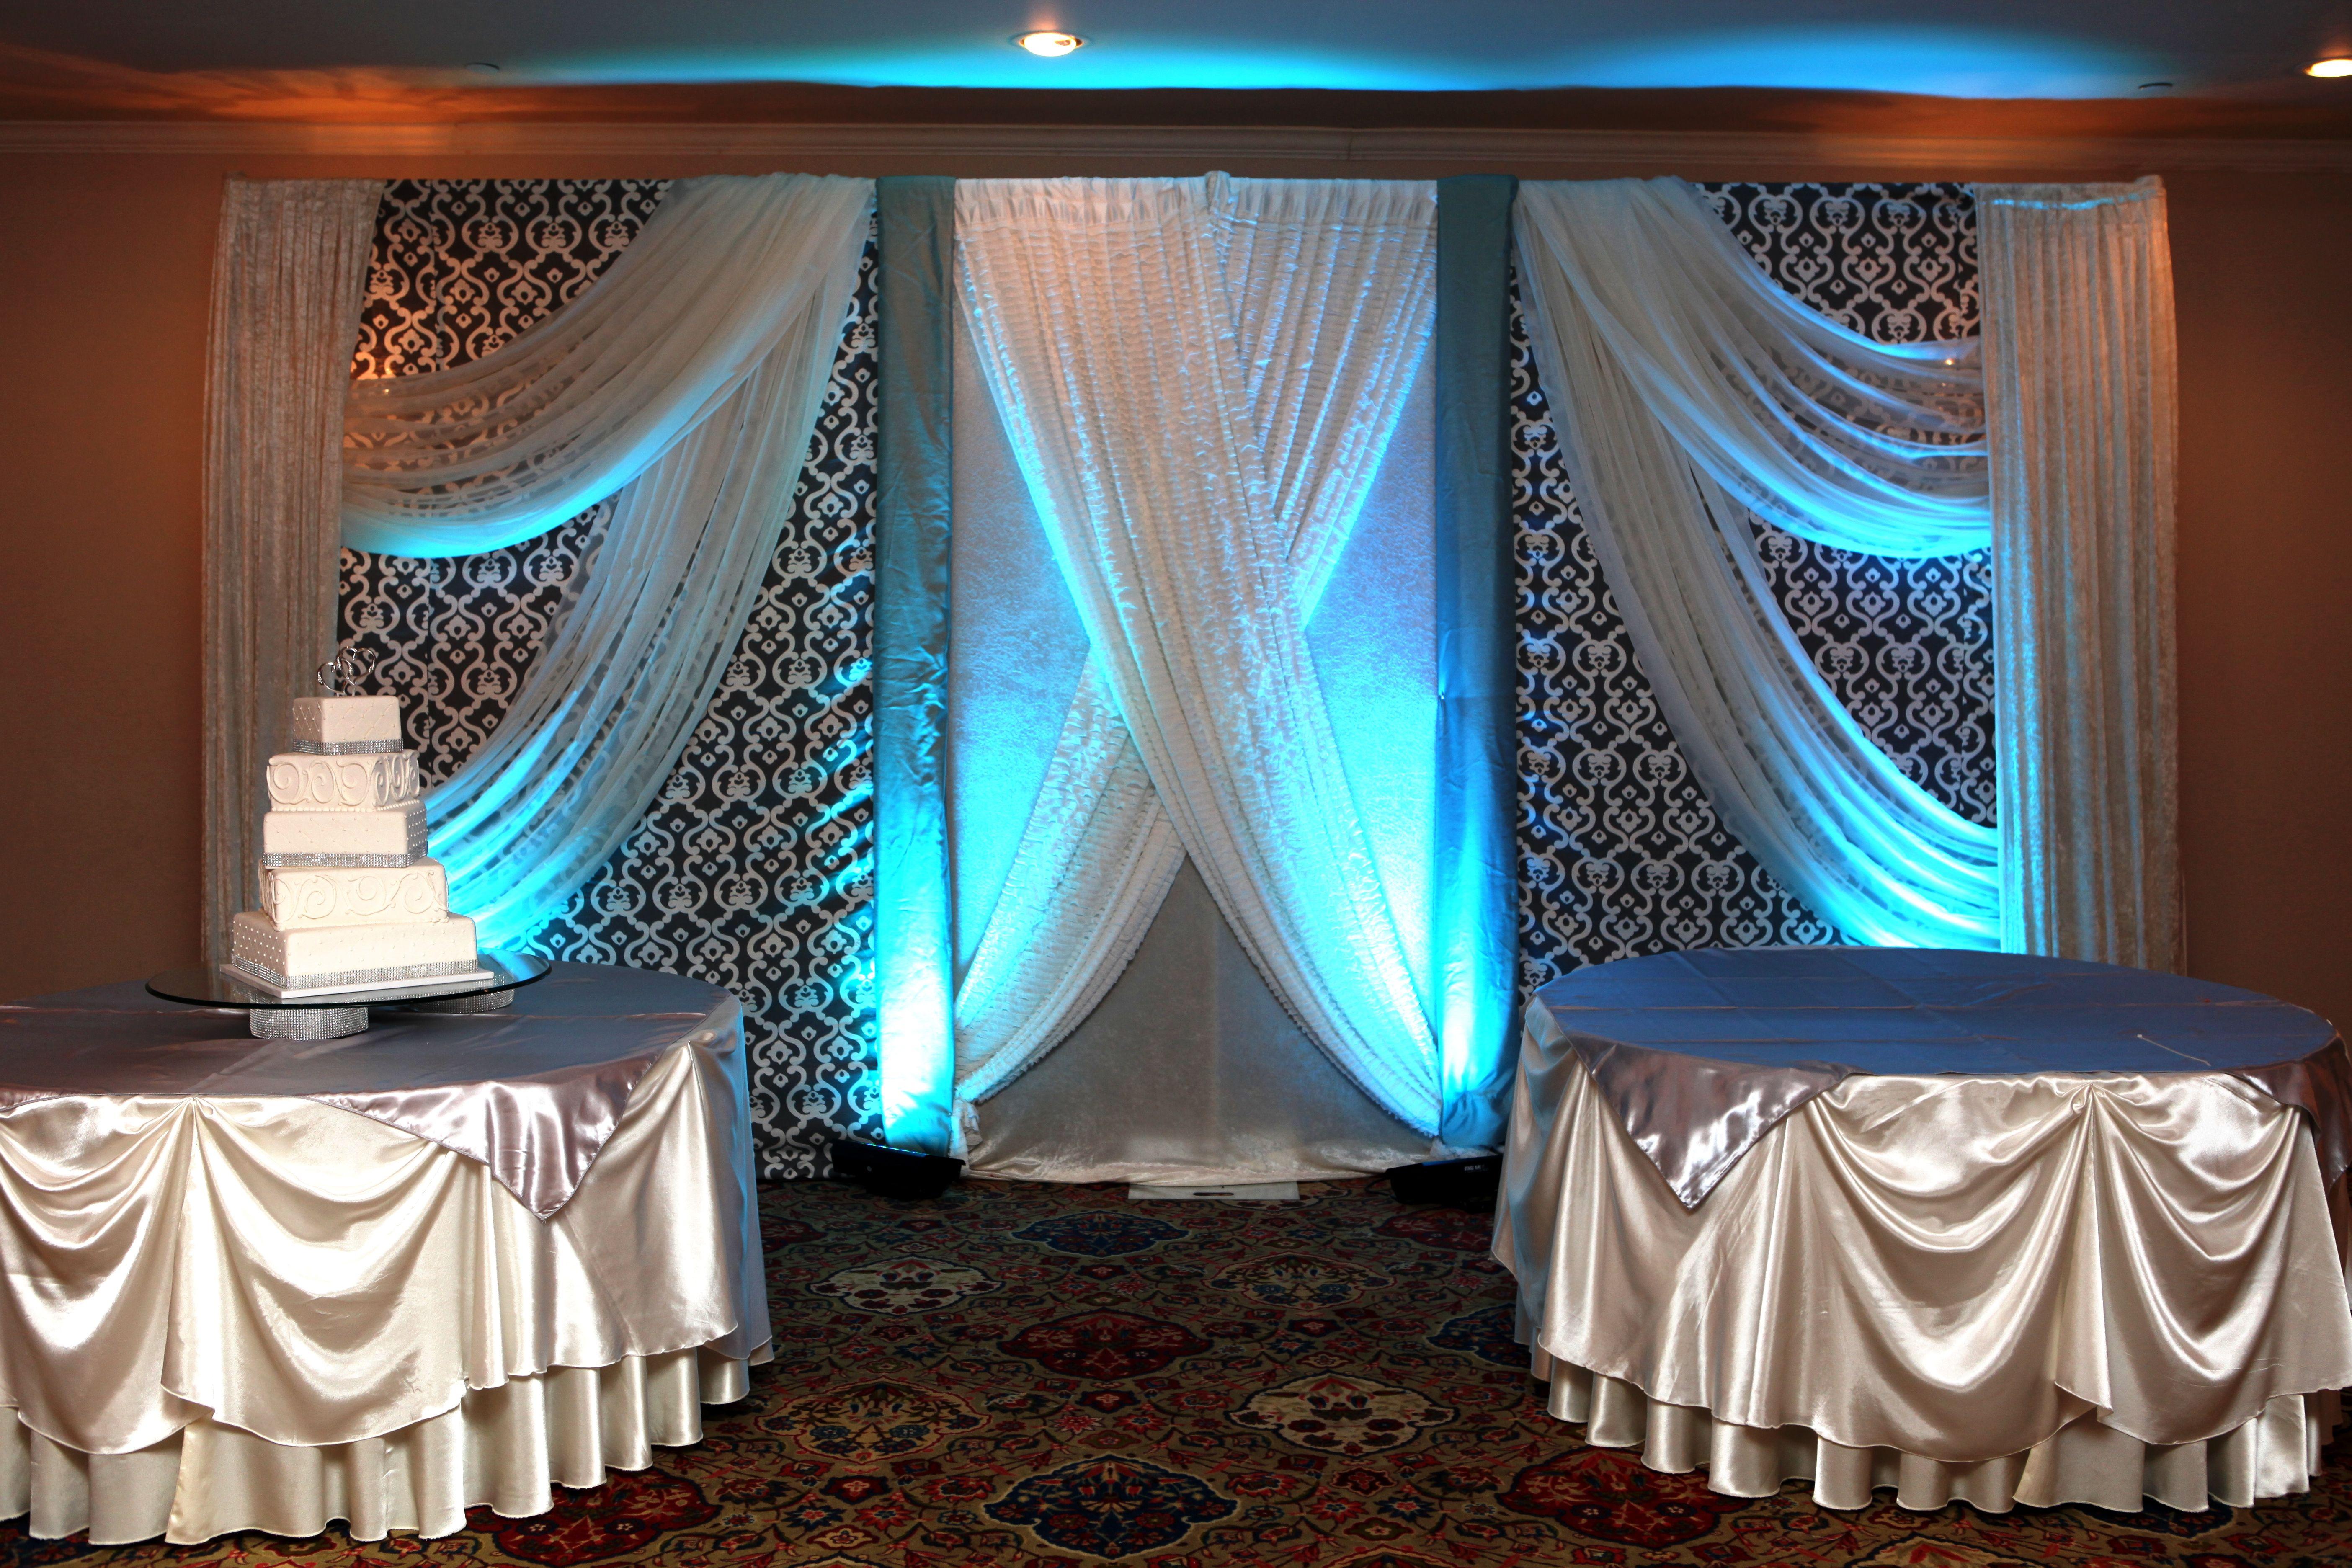 Wedding stage decoration with balloons  Pelazzio Full Service Wedding Venue creates beautiful custom